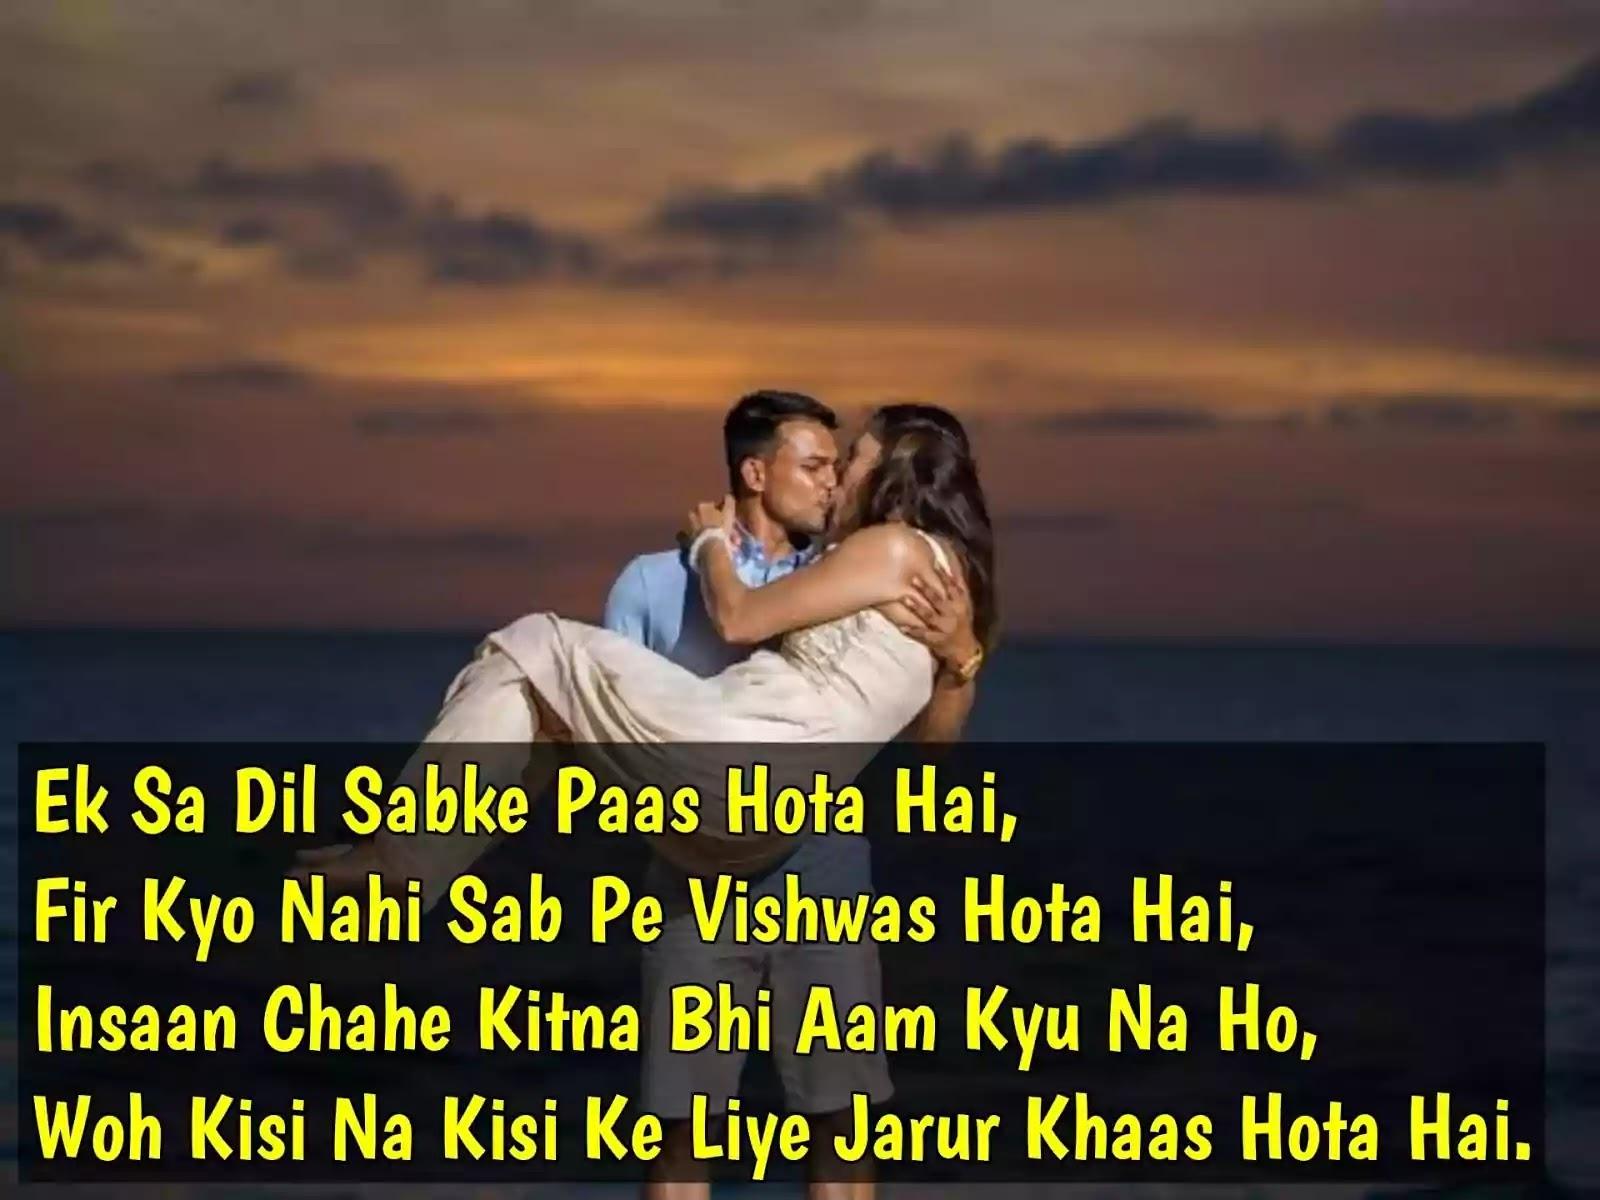 Love shayari Hindi me image